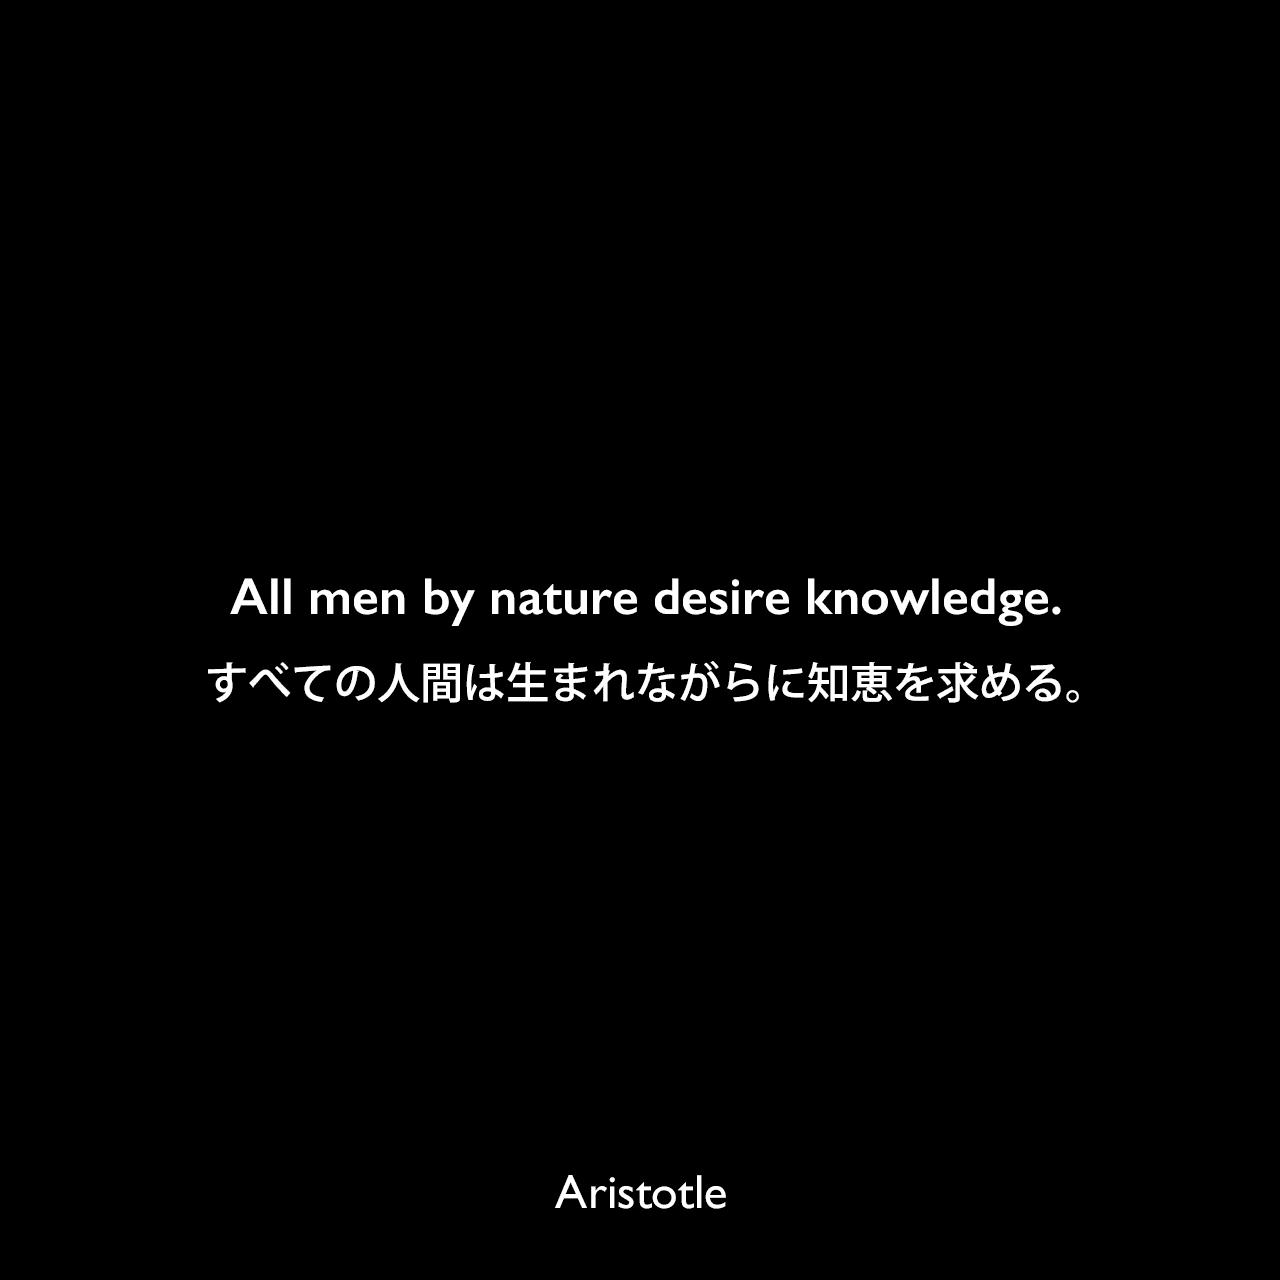 All men by nature desire knowledge.すべての人間は生まれながらに知恵を求める。- アリストテレスの著書「形而上学」よりAristotle